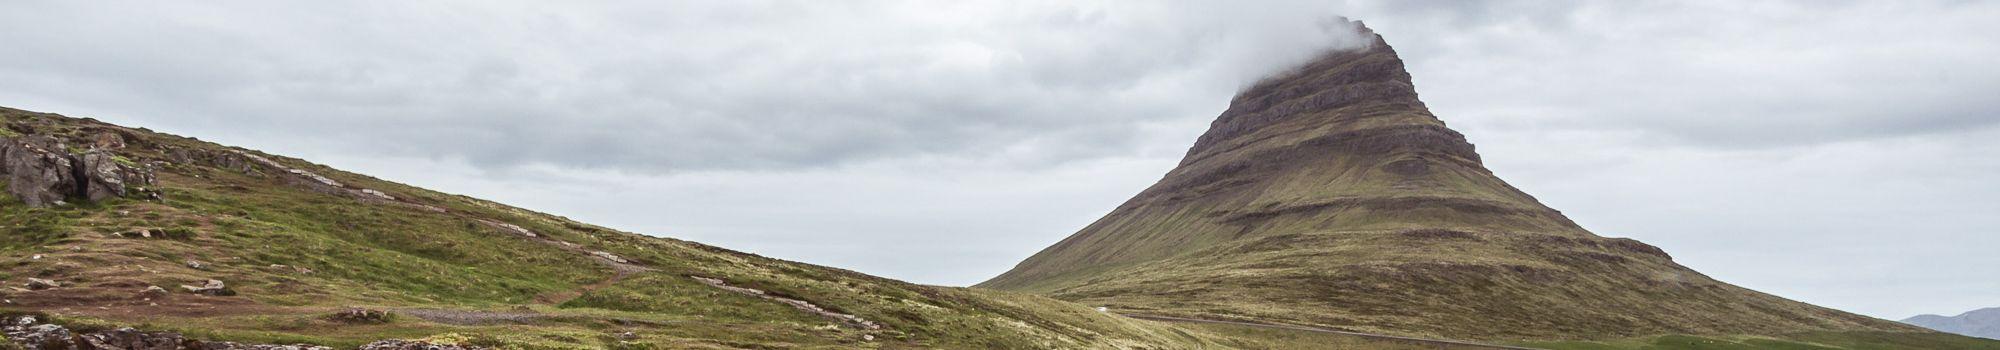 Kirkjufell-Snaefellsnes-Iceland-tour